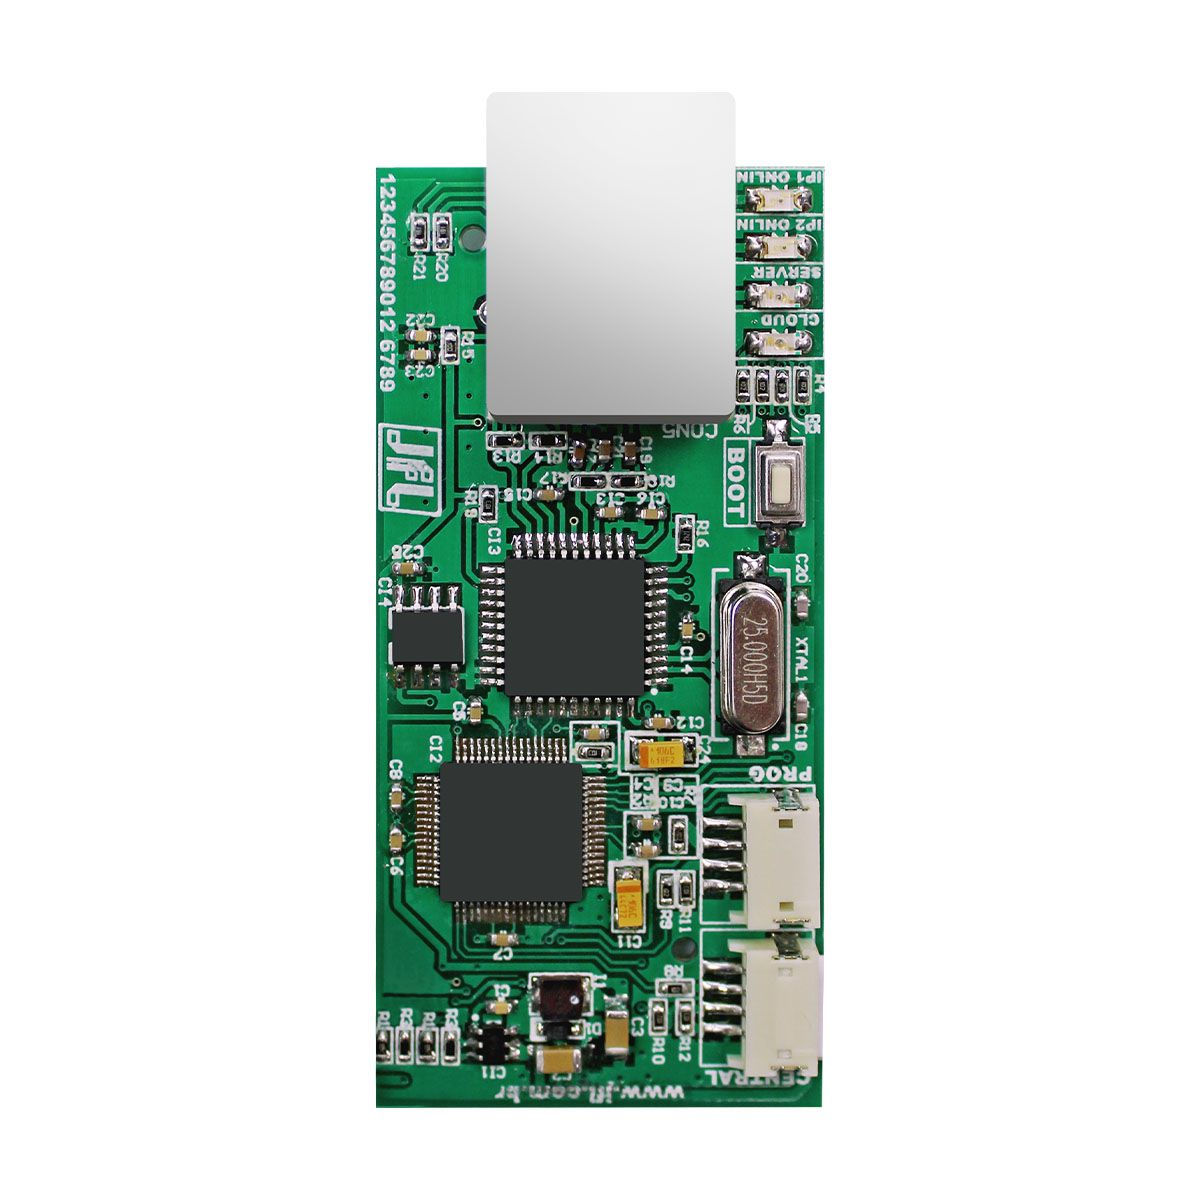 Kit Alarme Smart Cloud 18 Jfl Com 8 Sensores Idx 1001